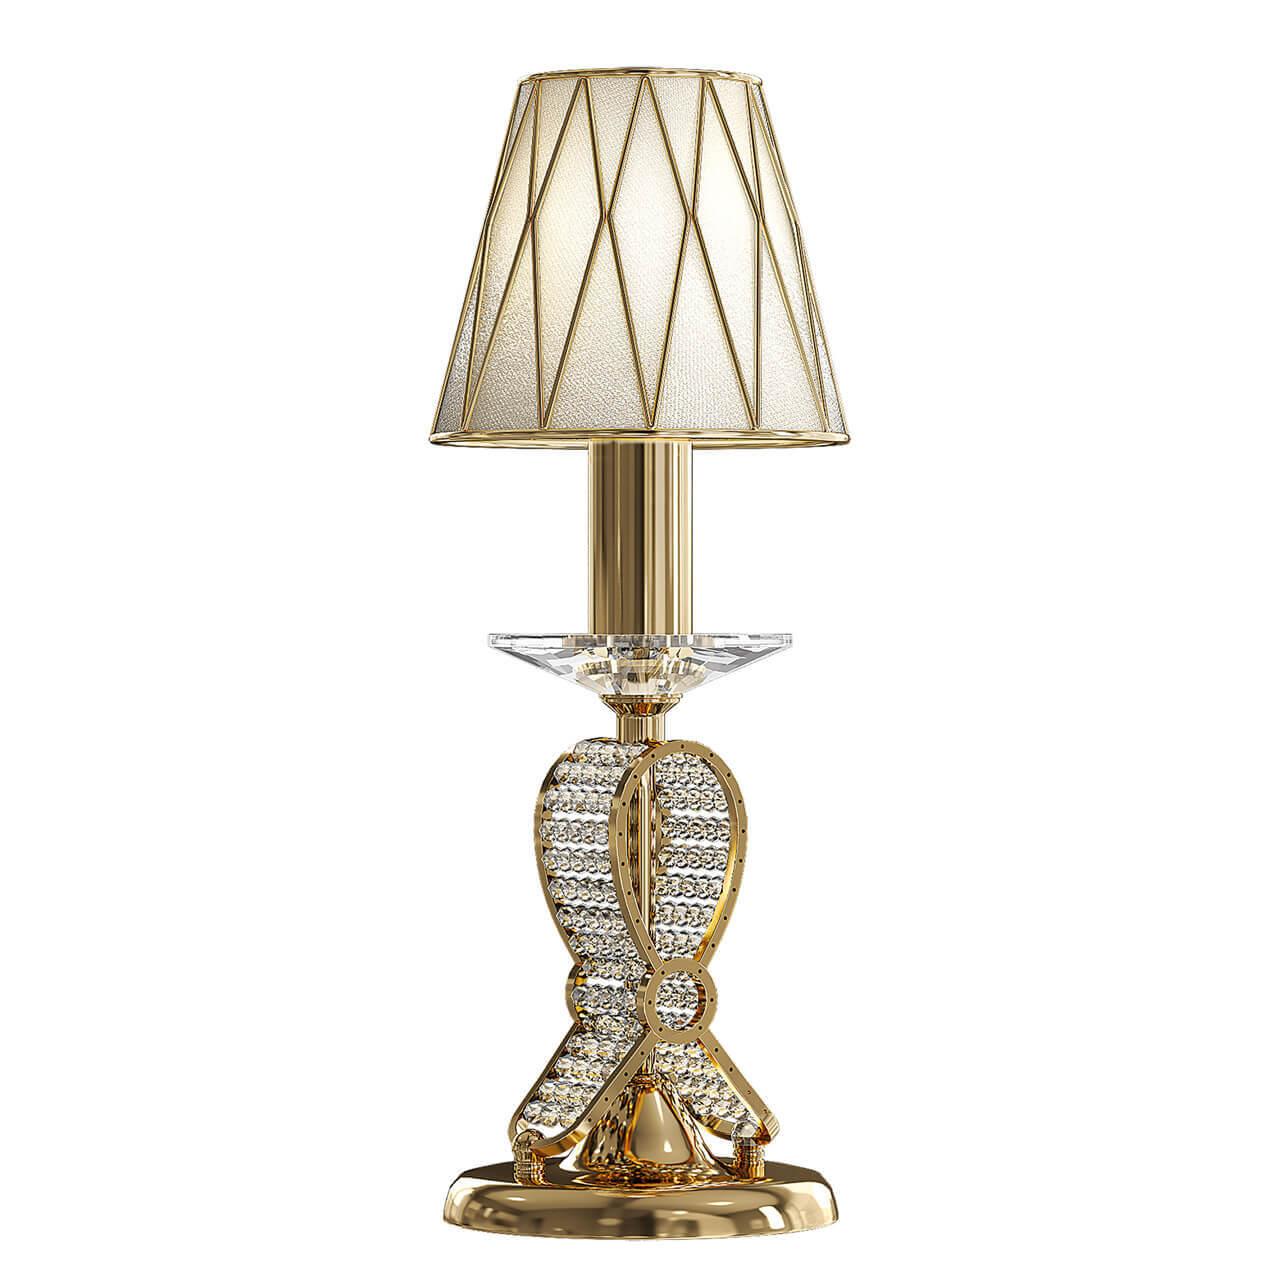 Настольная лампа Osgona Riccio 705912 osgona настольная лампа декоративная osgona tesoro 710952